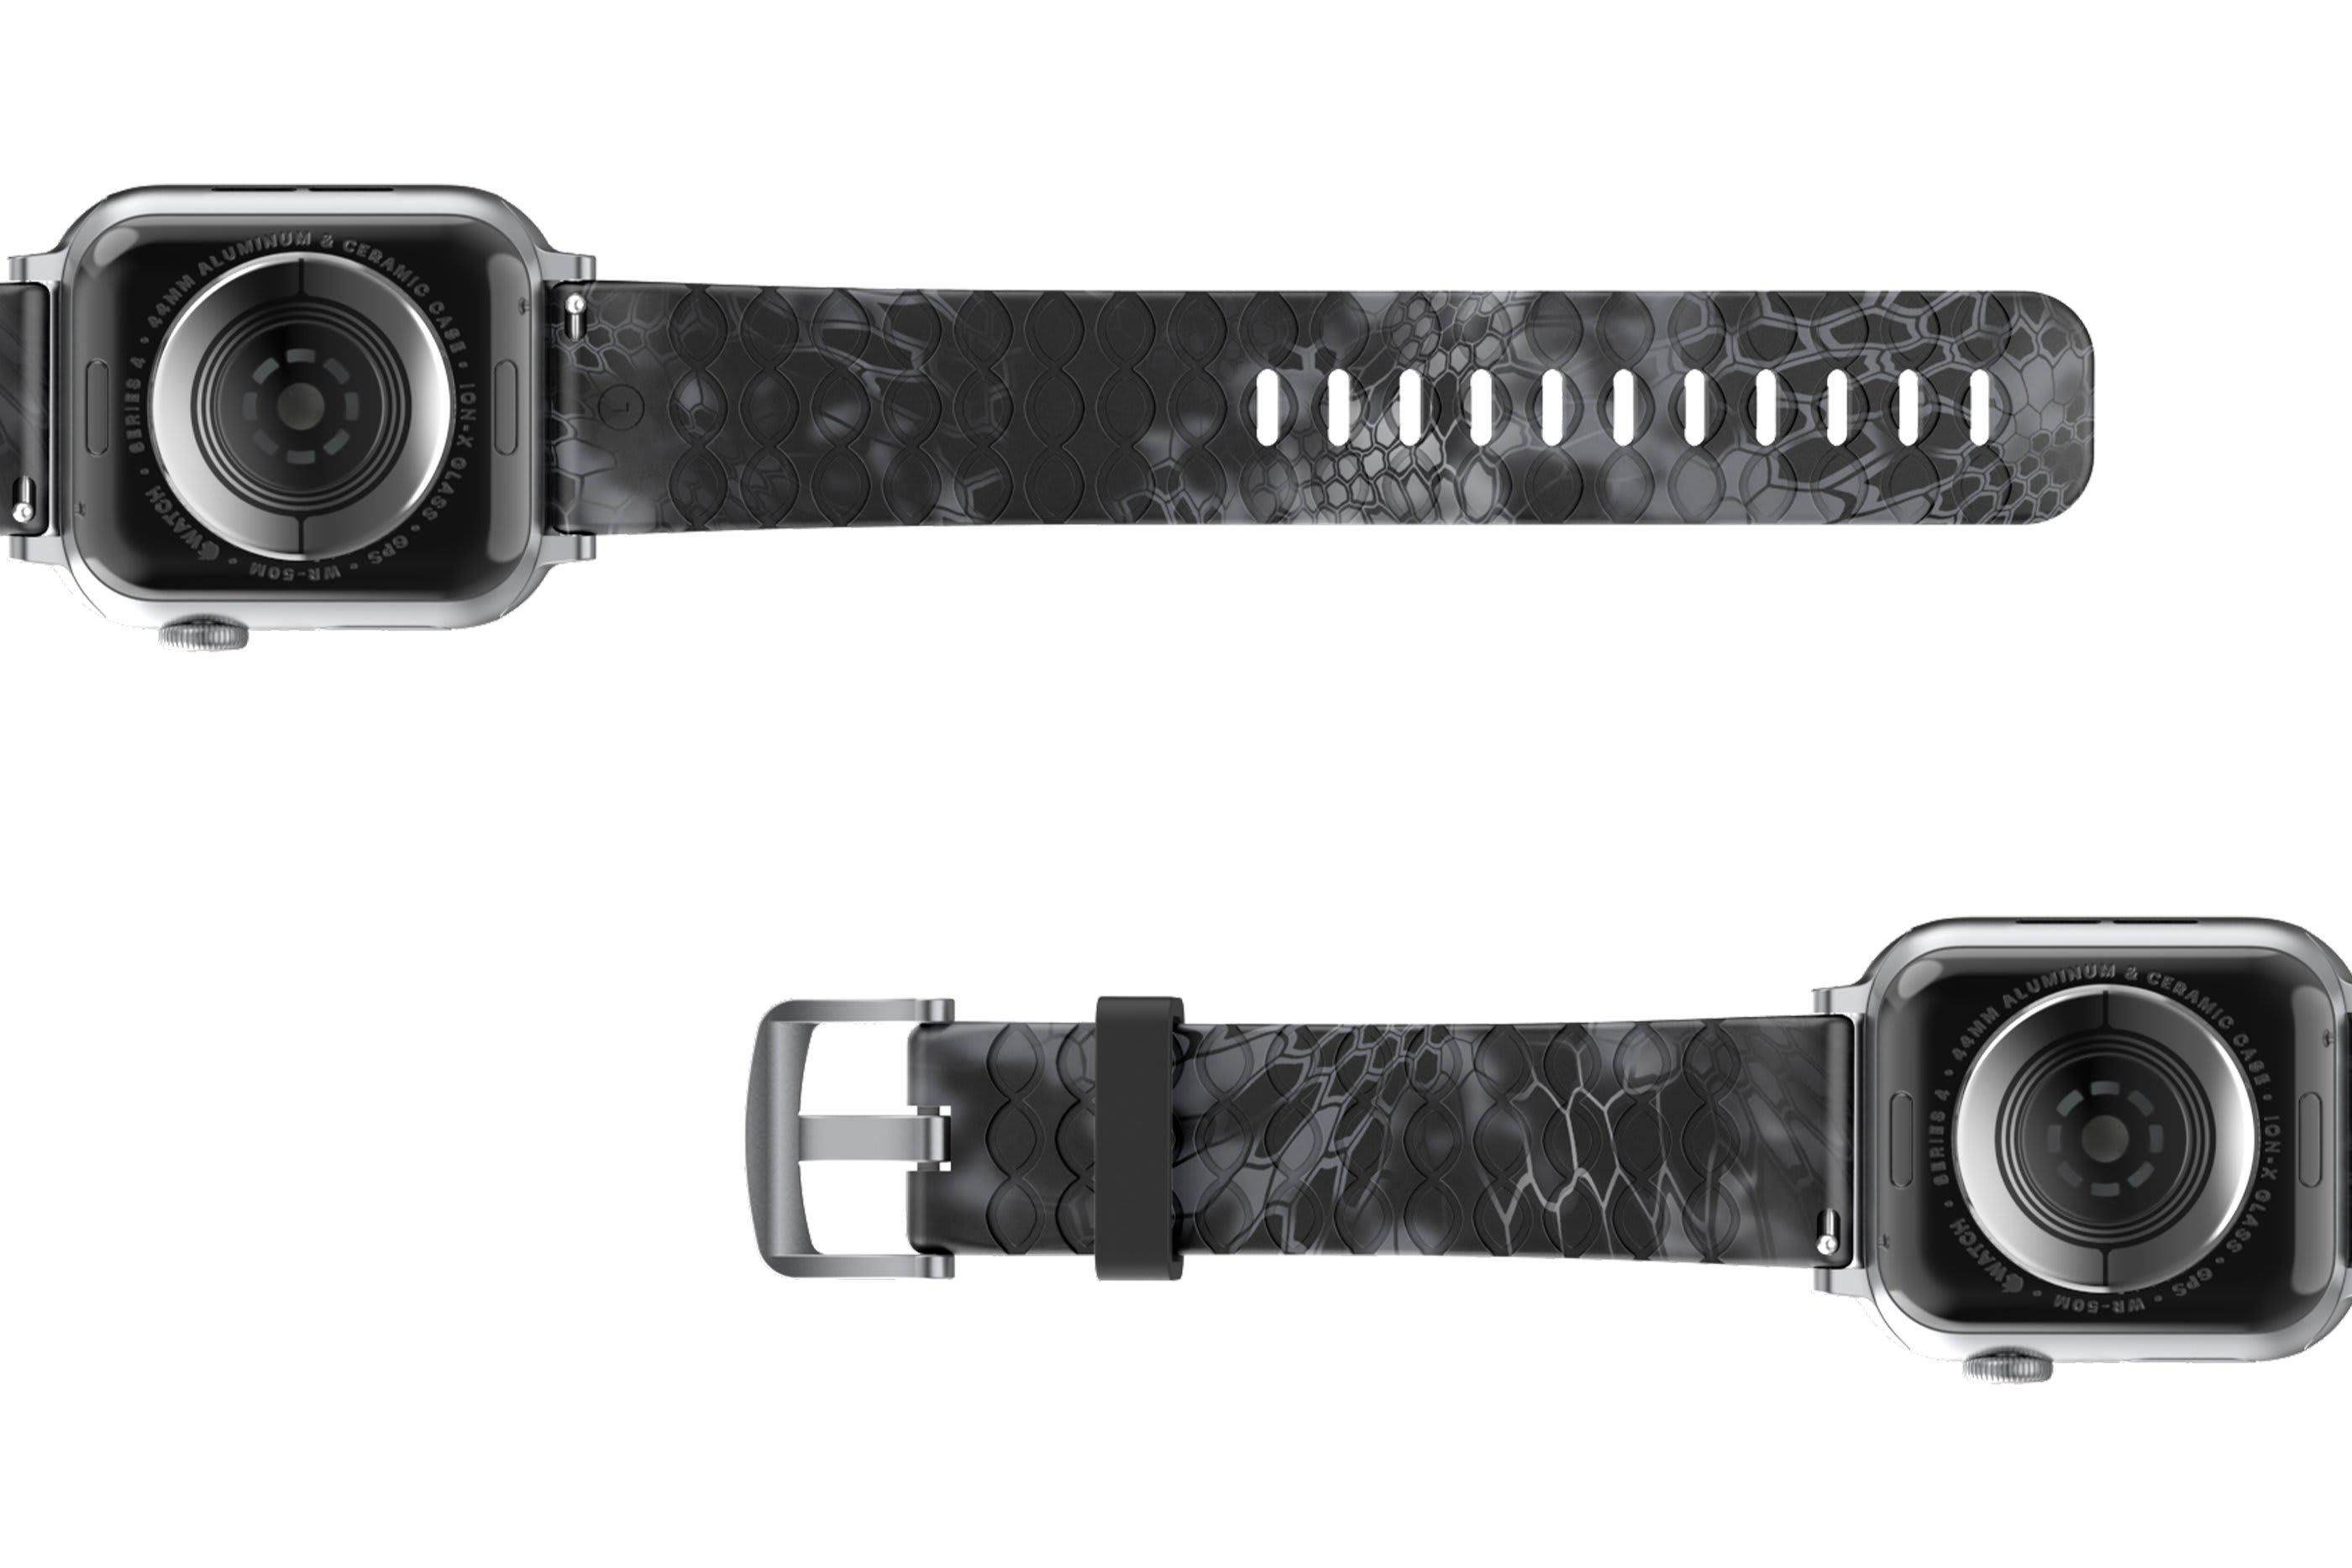 Kryptek Typhon Apple Watch Band with Silver hardware viewed bottom up